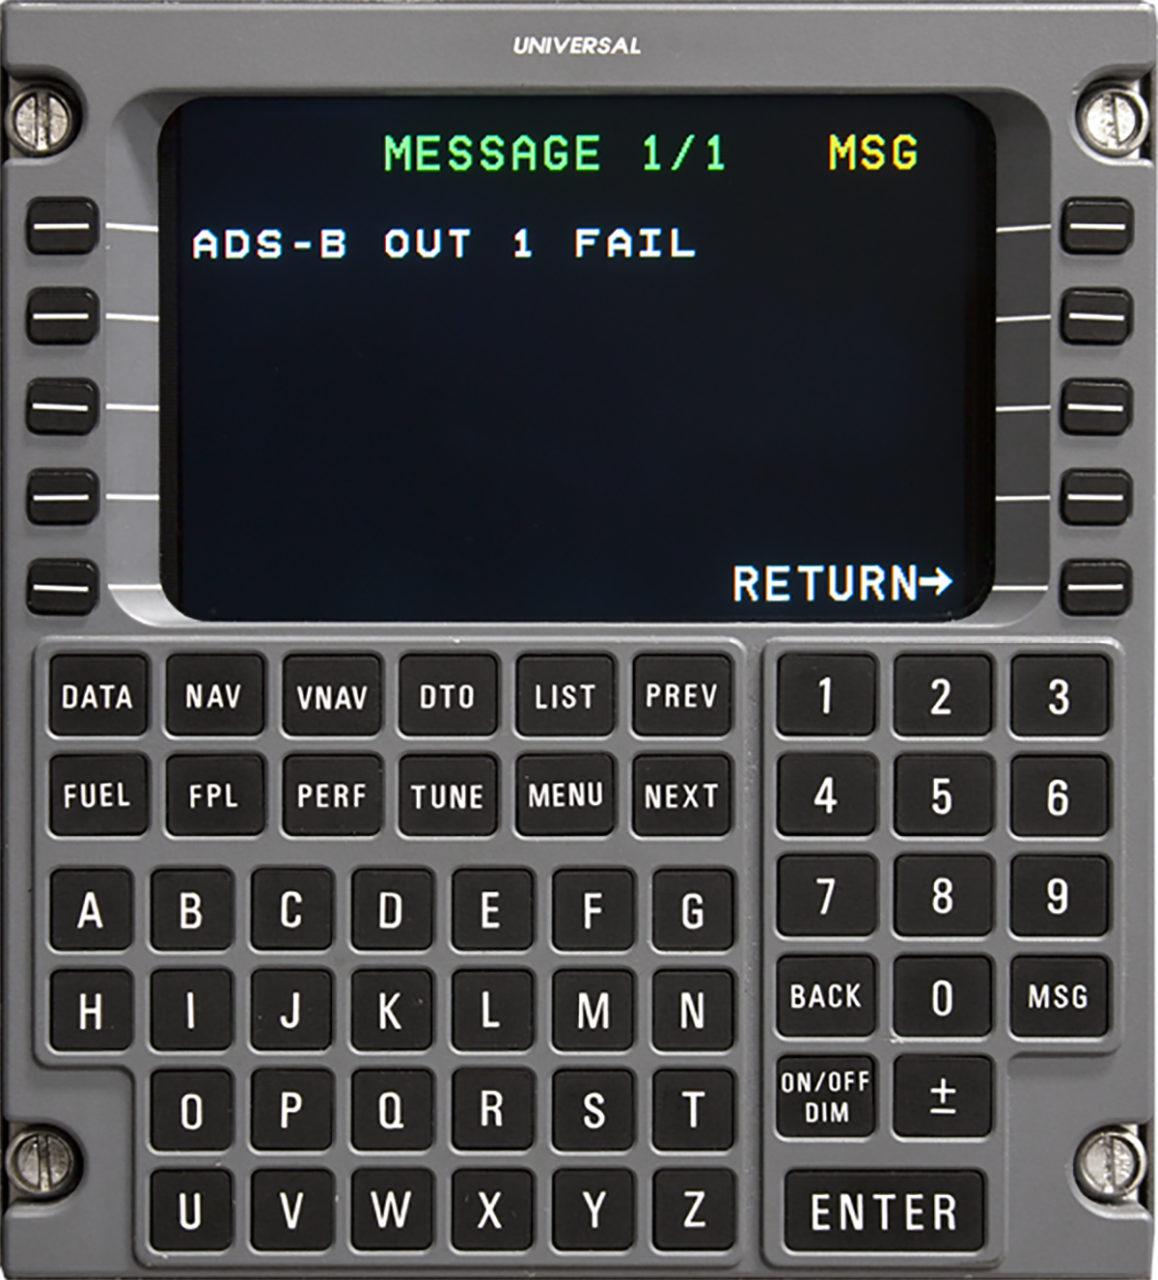 Universal Avionics SBAS-FMS ADS-B Out fail message